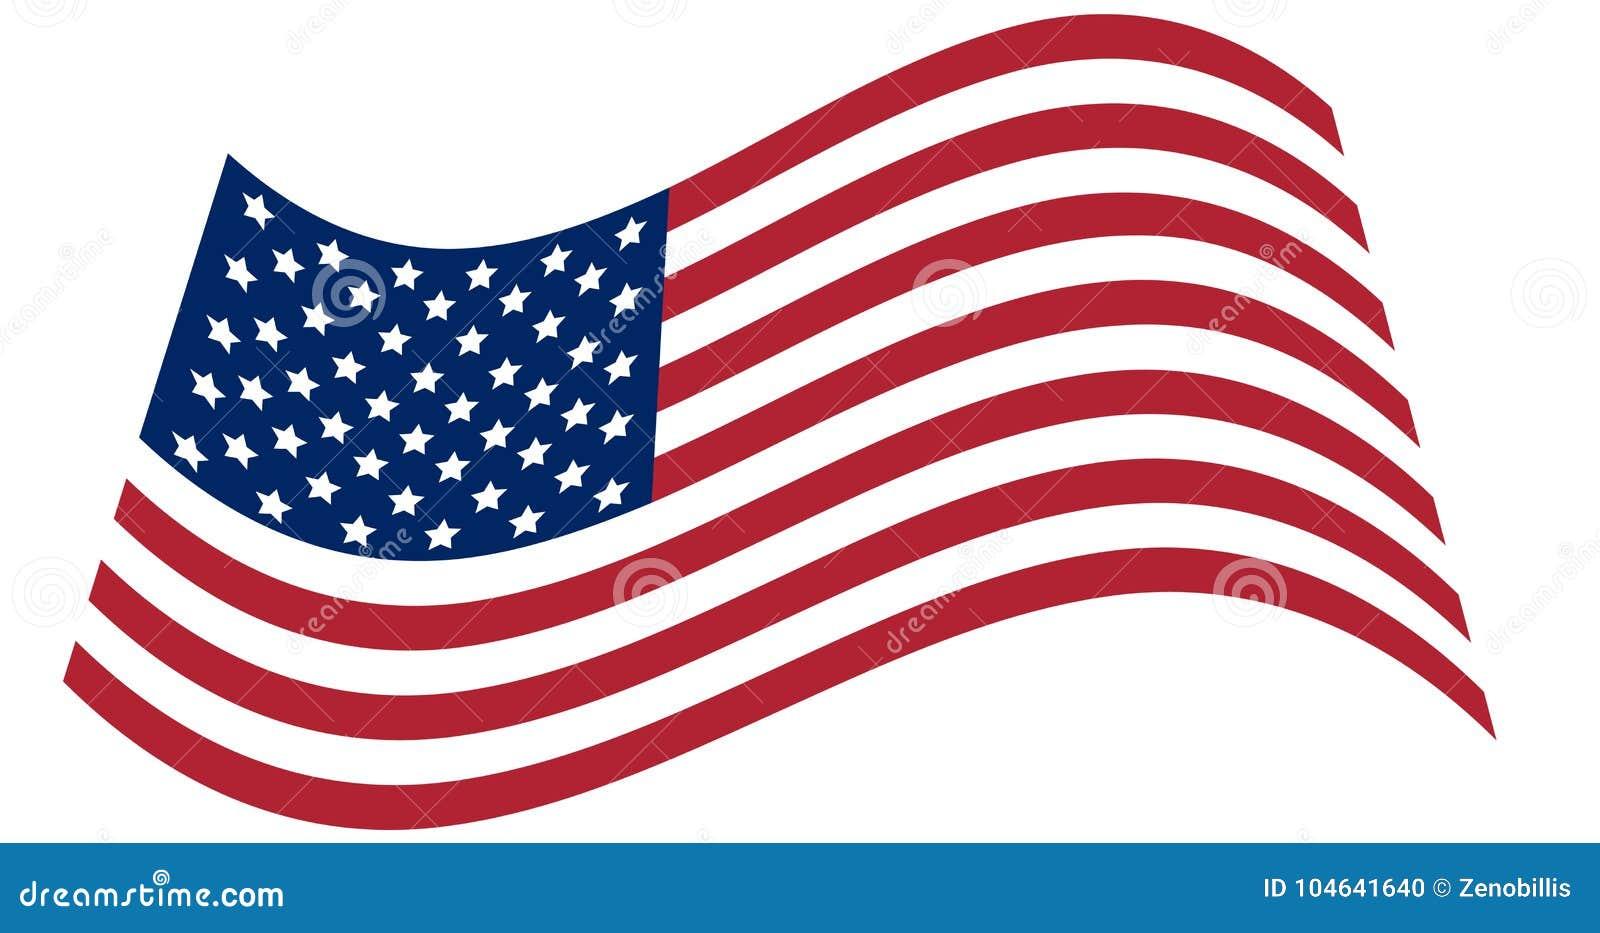 Waving National Flag Of United States Of America Isolated On White